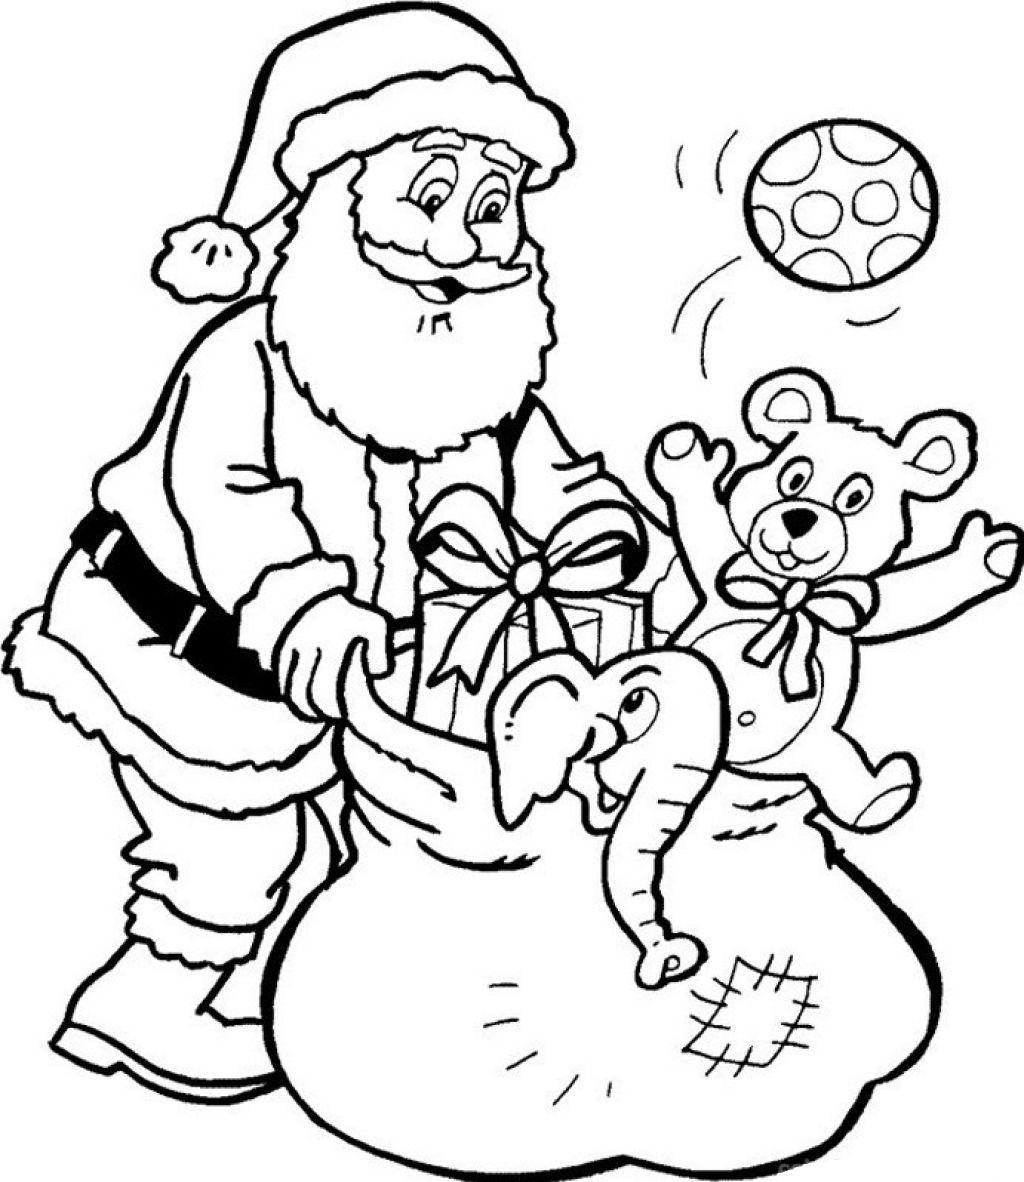 Santa Claus And Presents Printable Coloring Pages Christmas - Santa Coloring Pages Printable Free